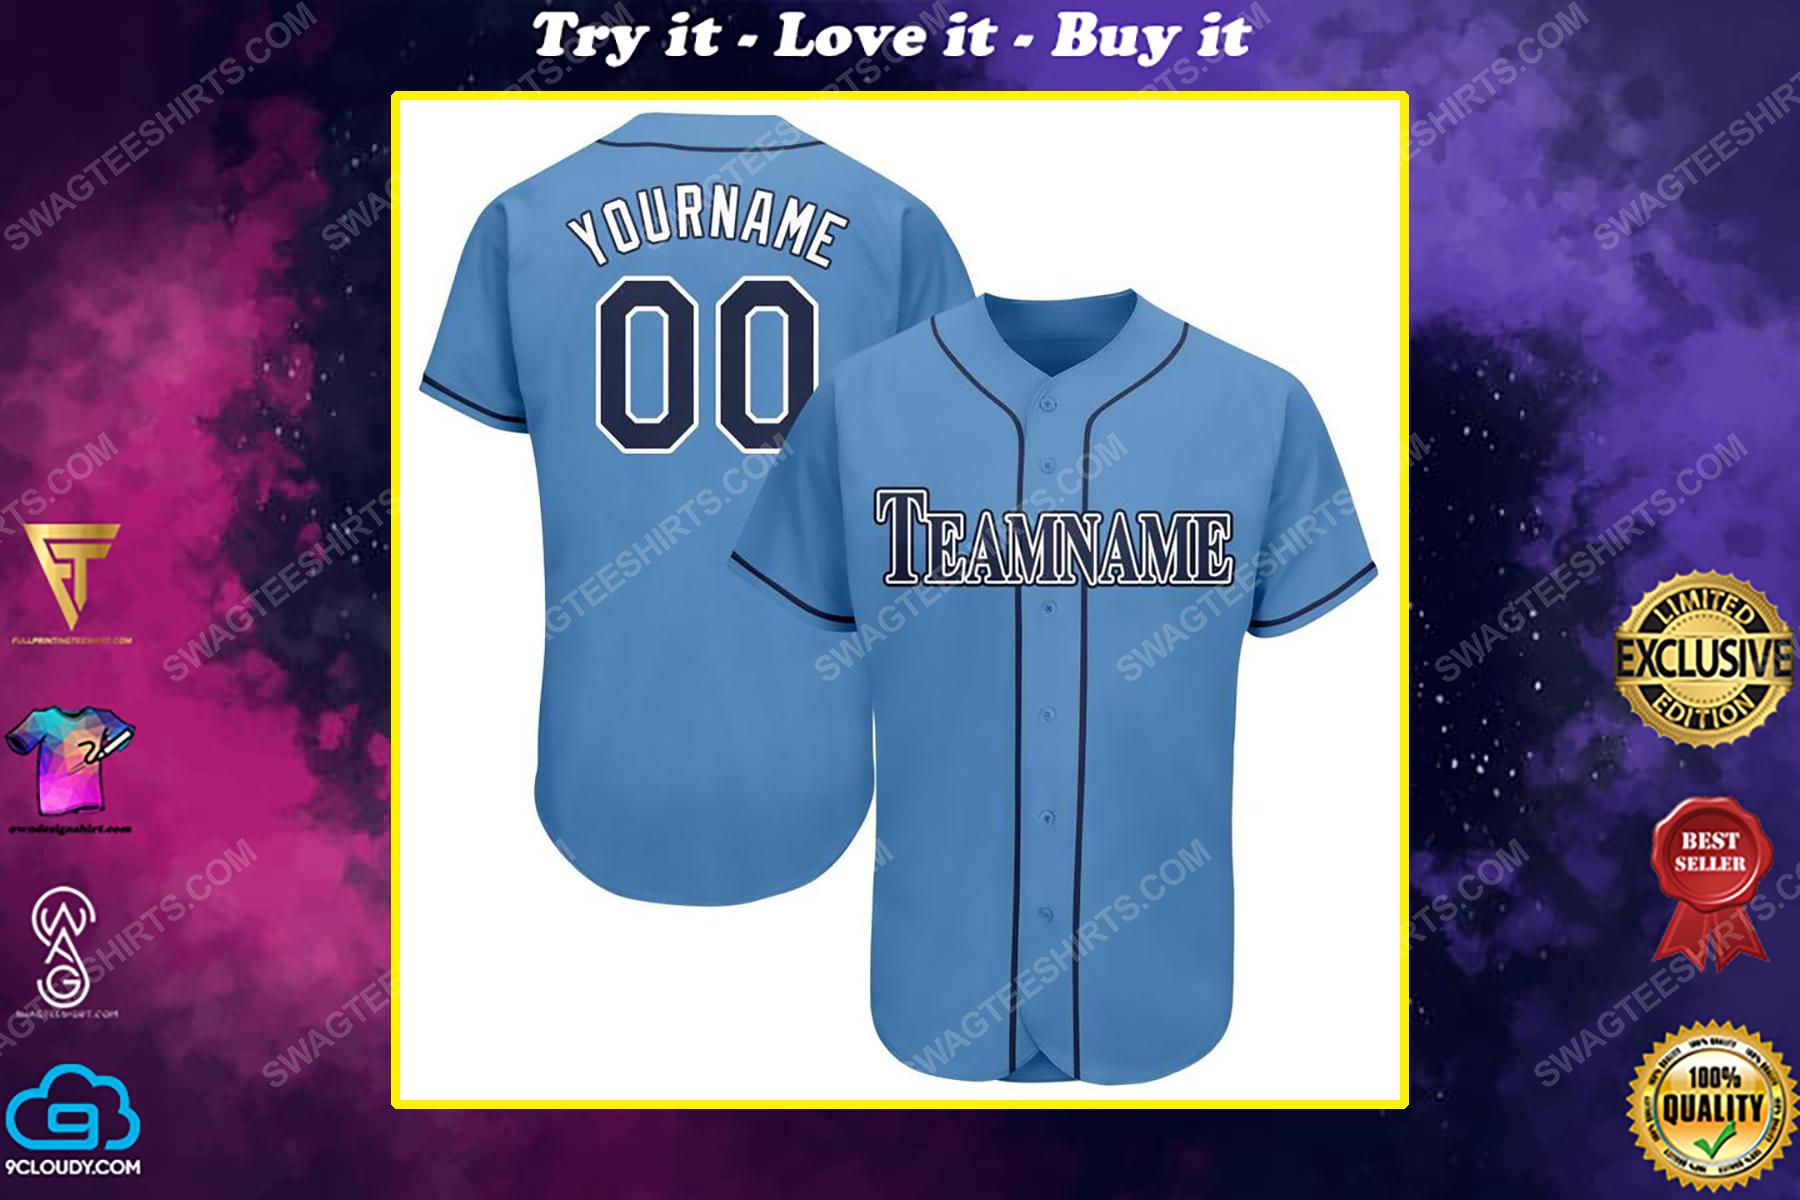 Custom team name tampa bay rays full printed baseball jersey